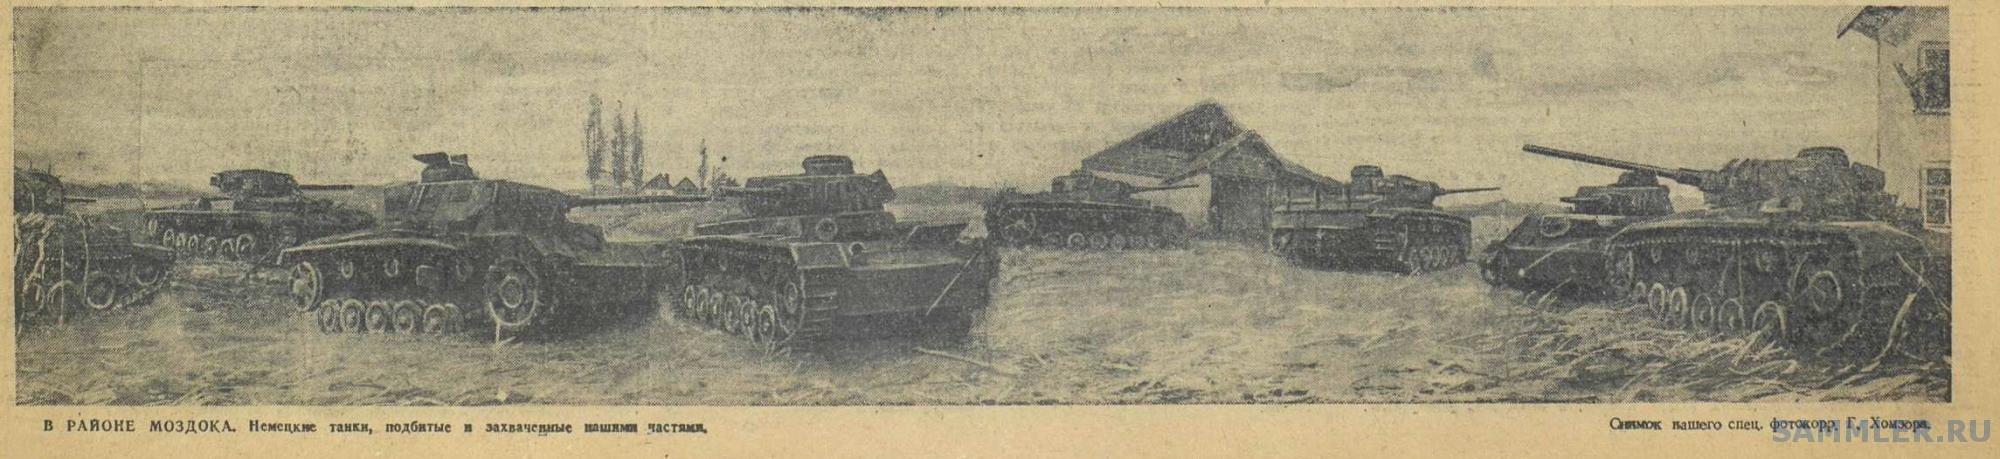 КЗ 29-09-1942.jpg